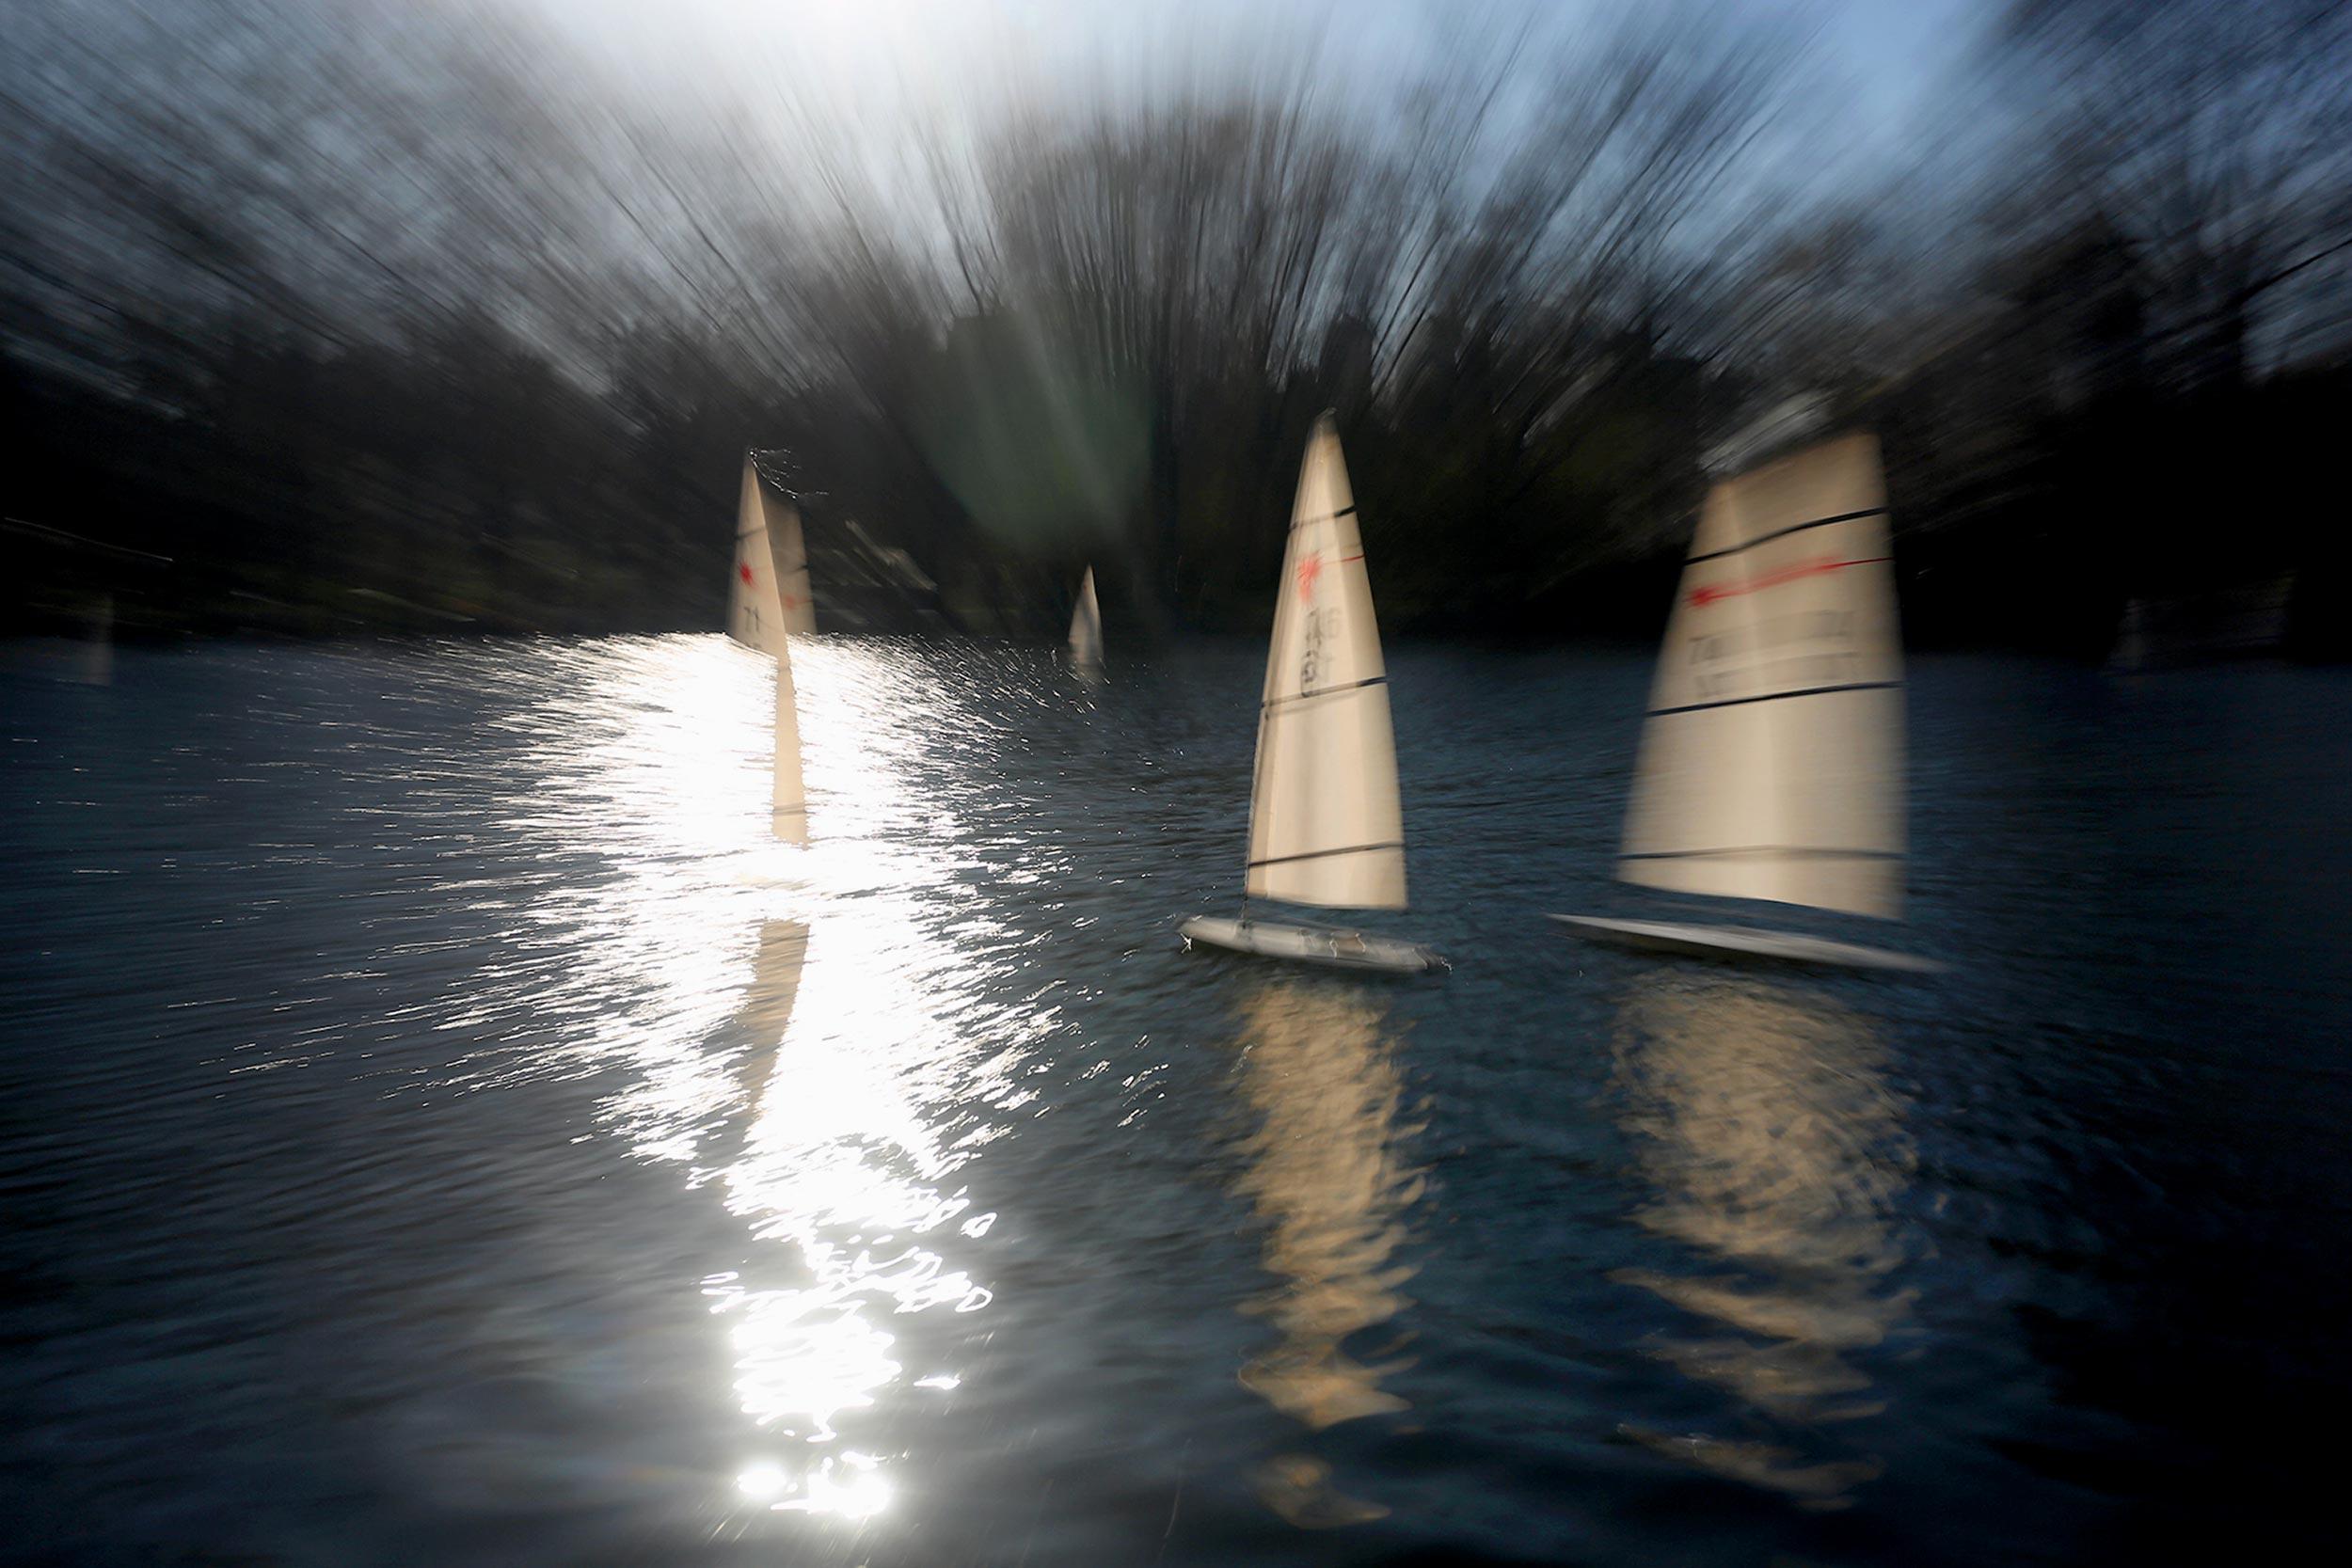 Central-Park--Boats-03387-copy.jpg